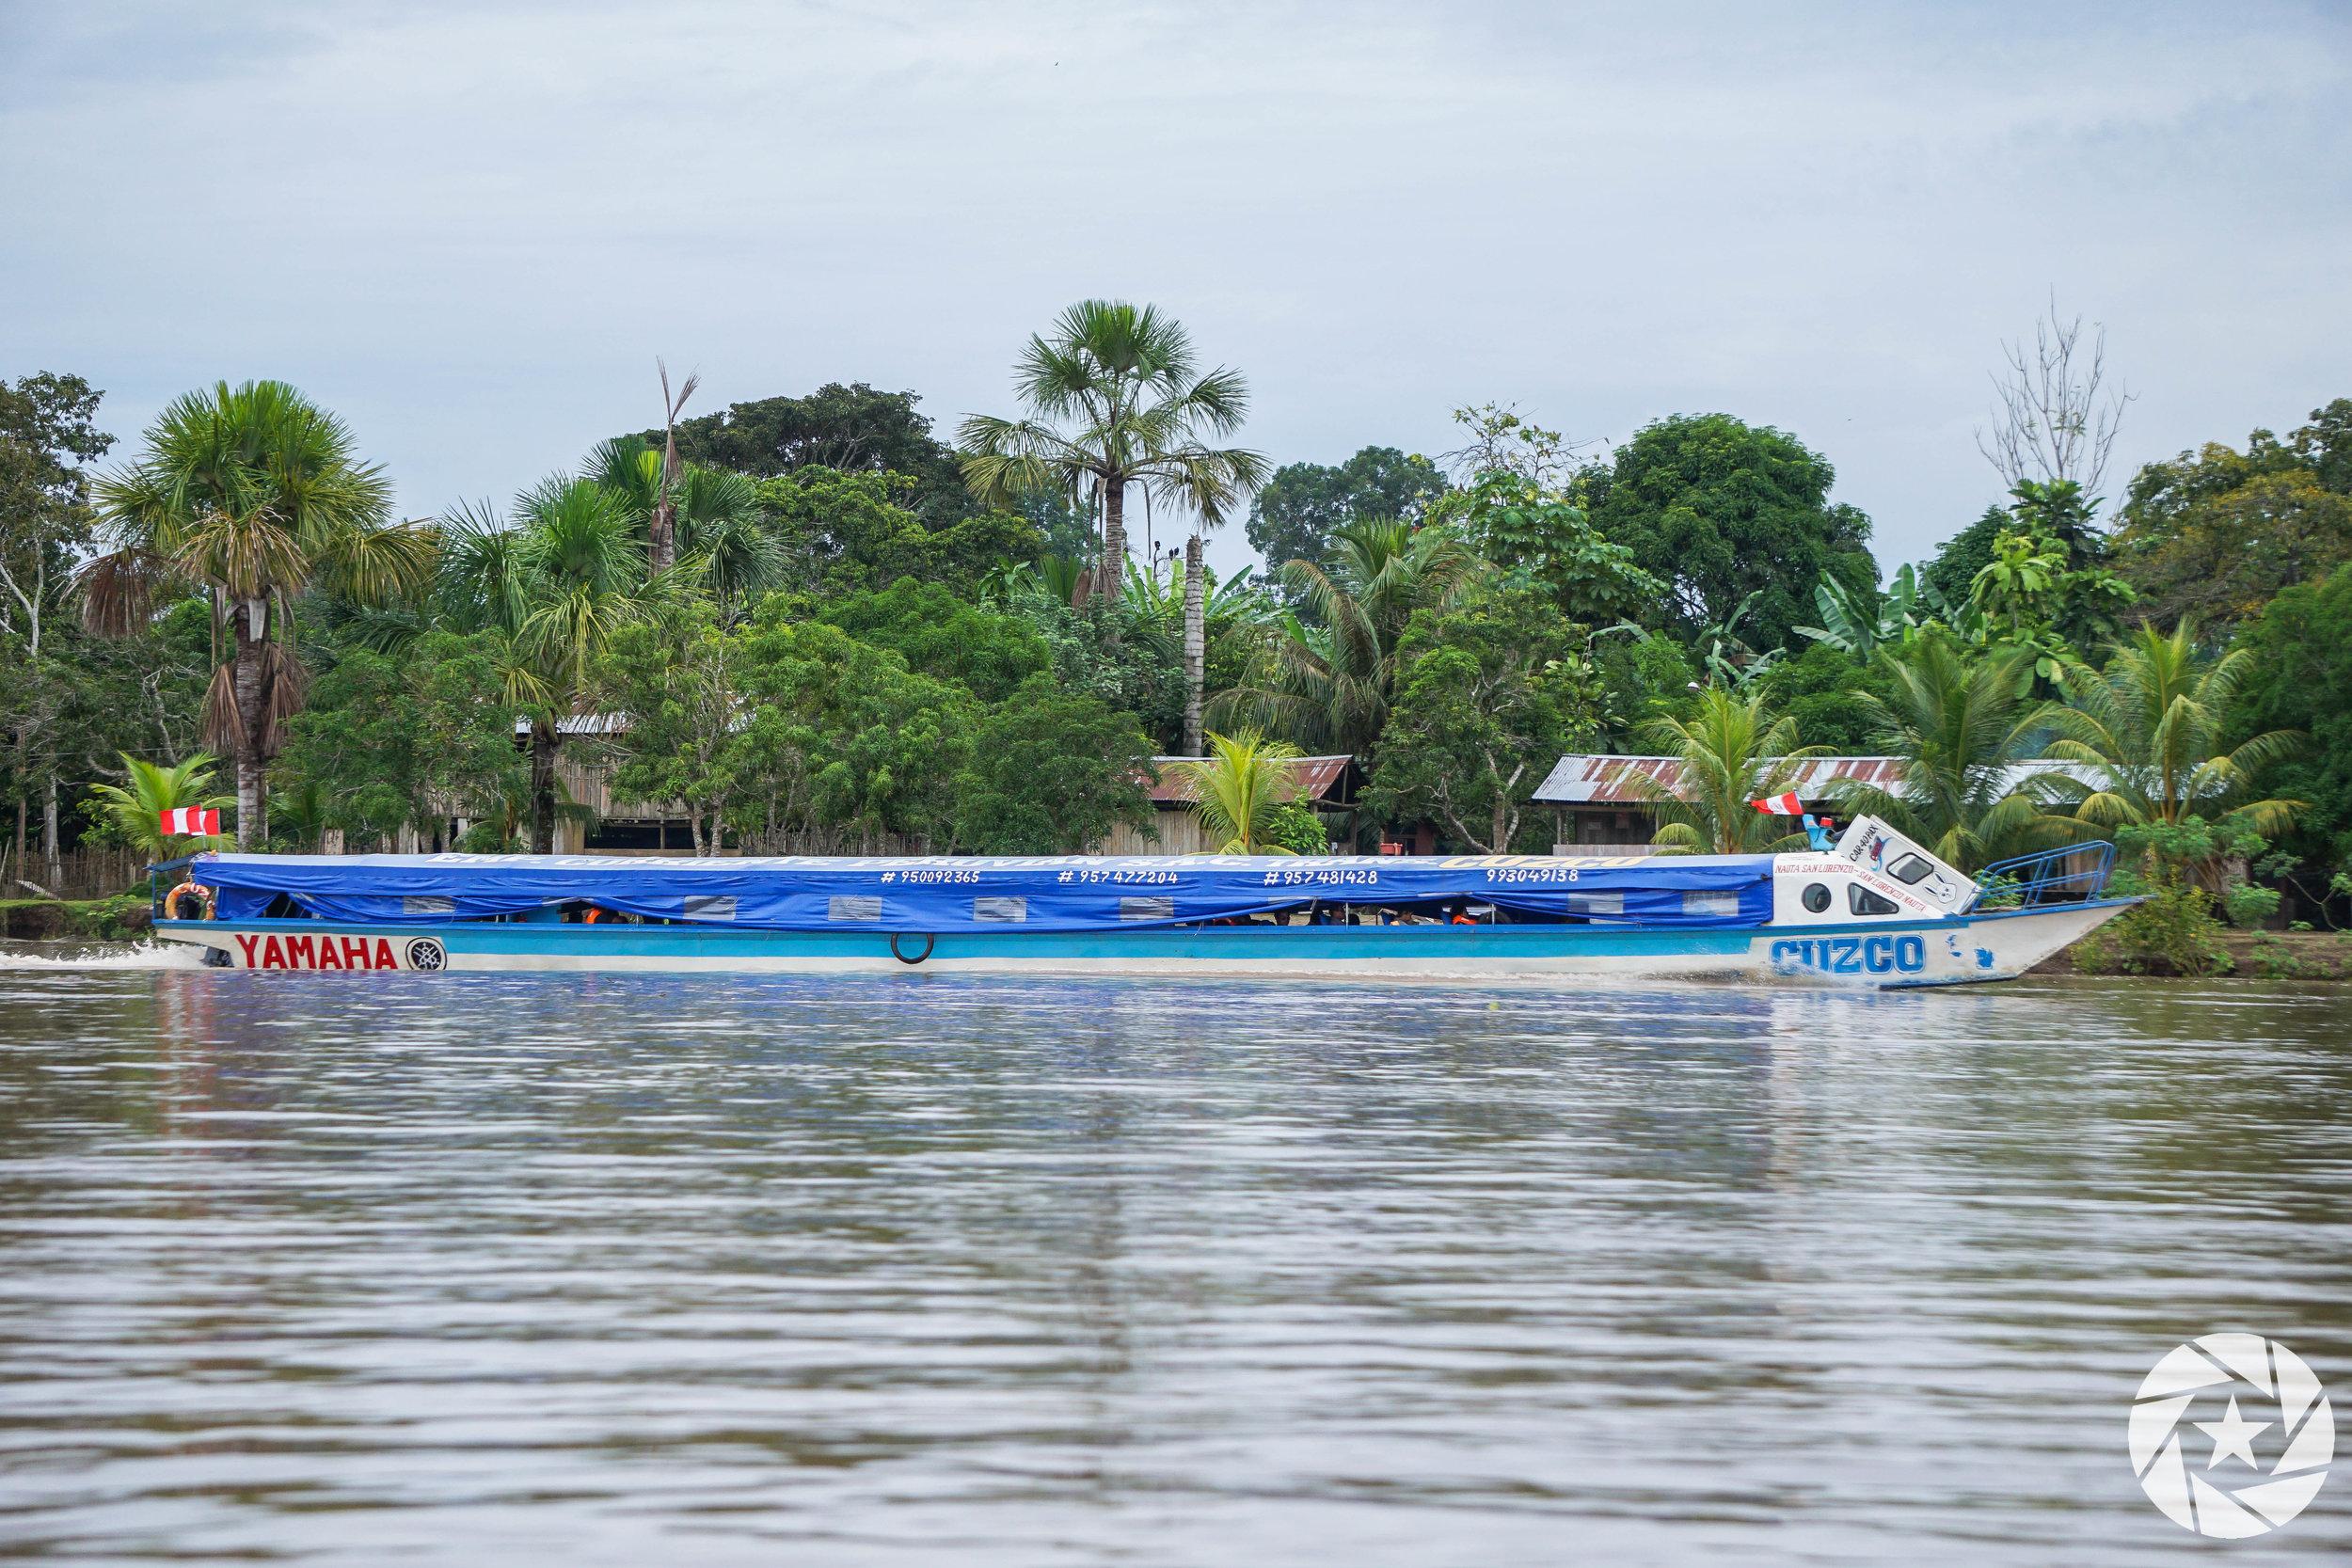 Yamaha Cuzco Speed Boat